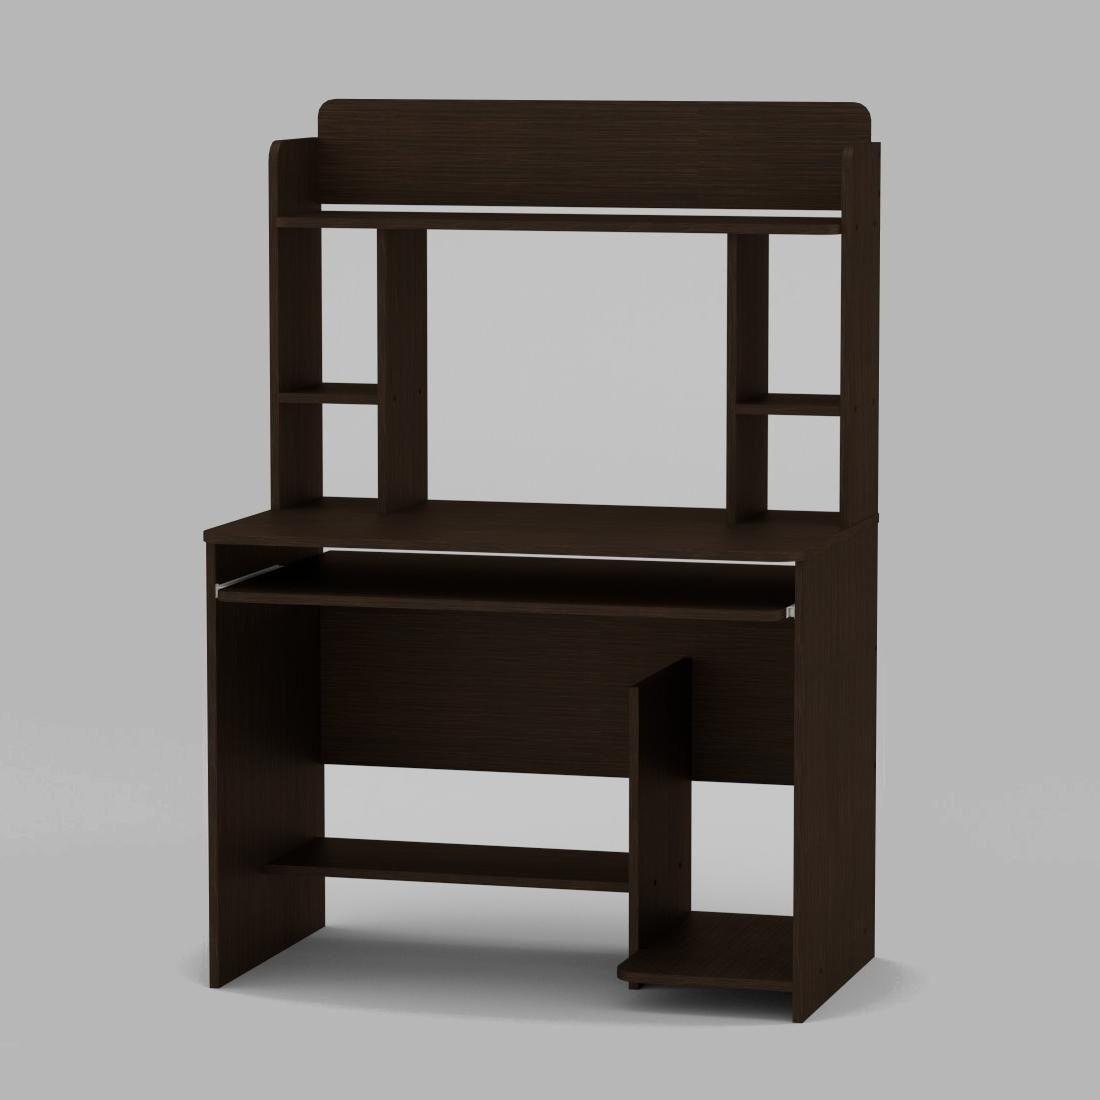 Компьютерный стол Компанит СКМ-6 1000х598х756 мм венге